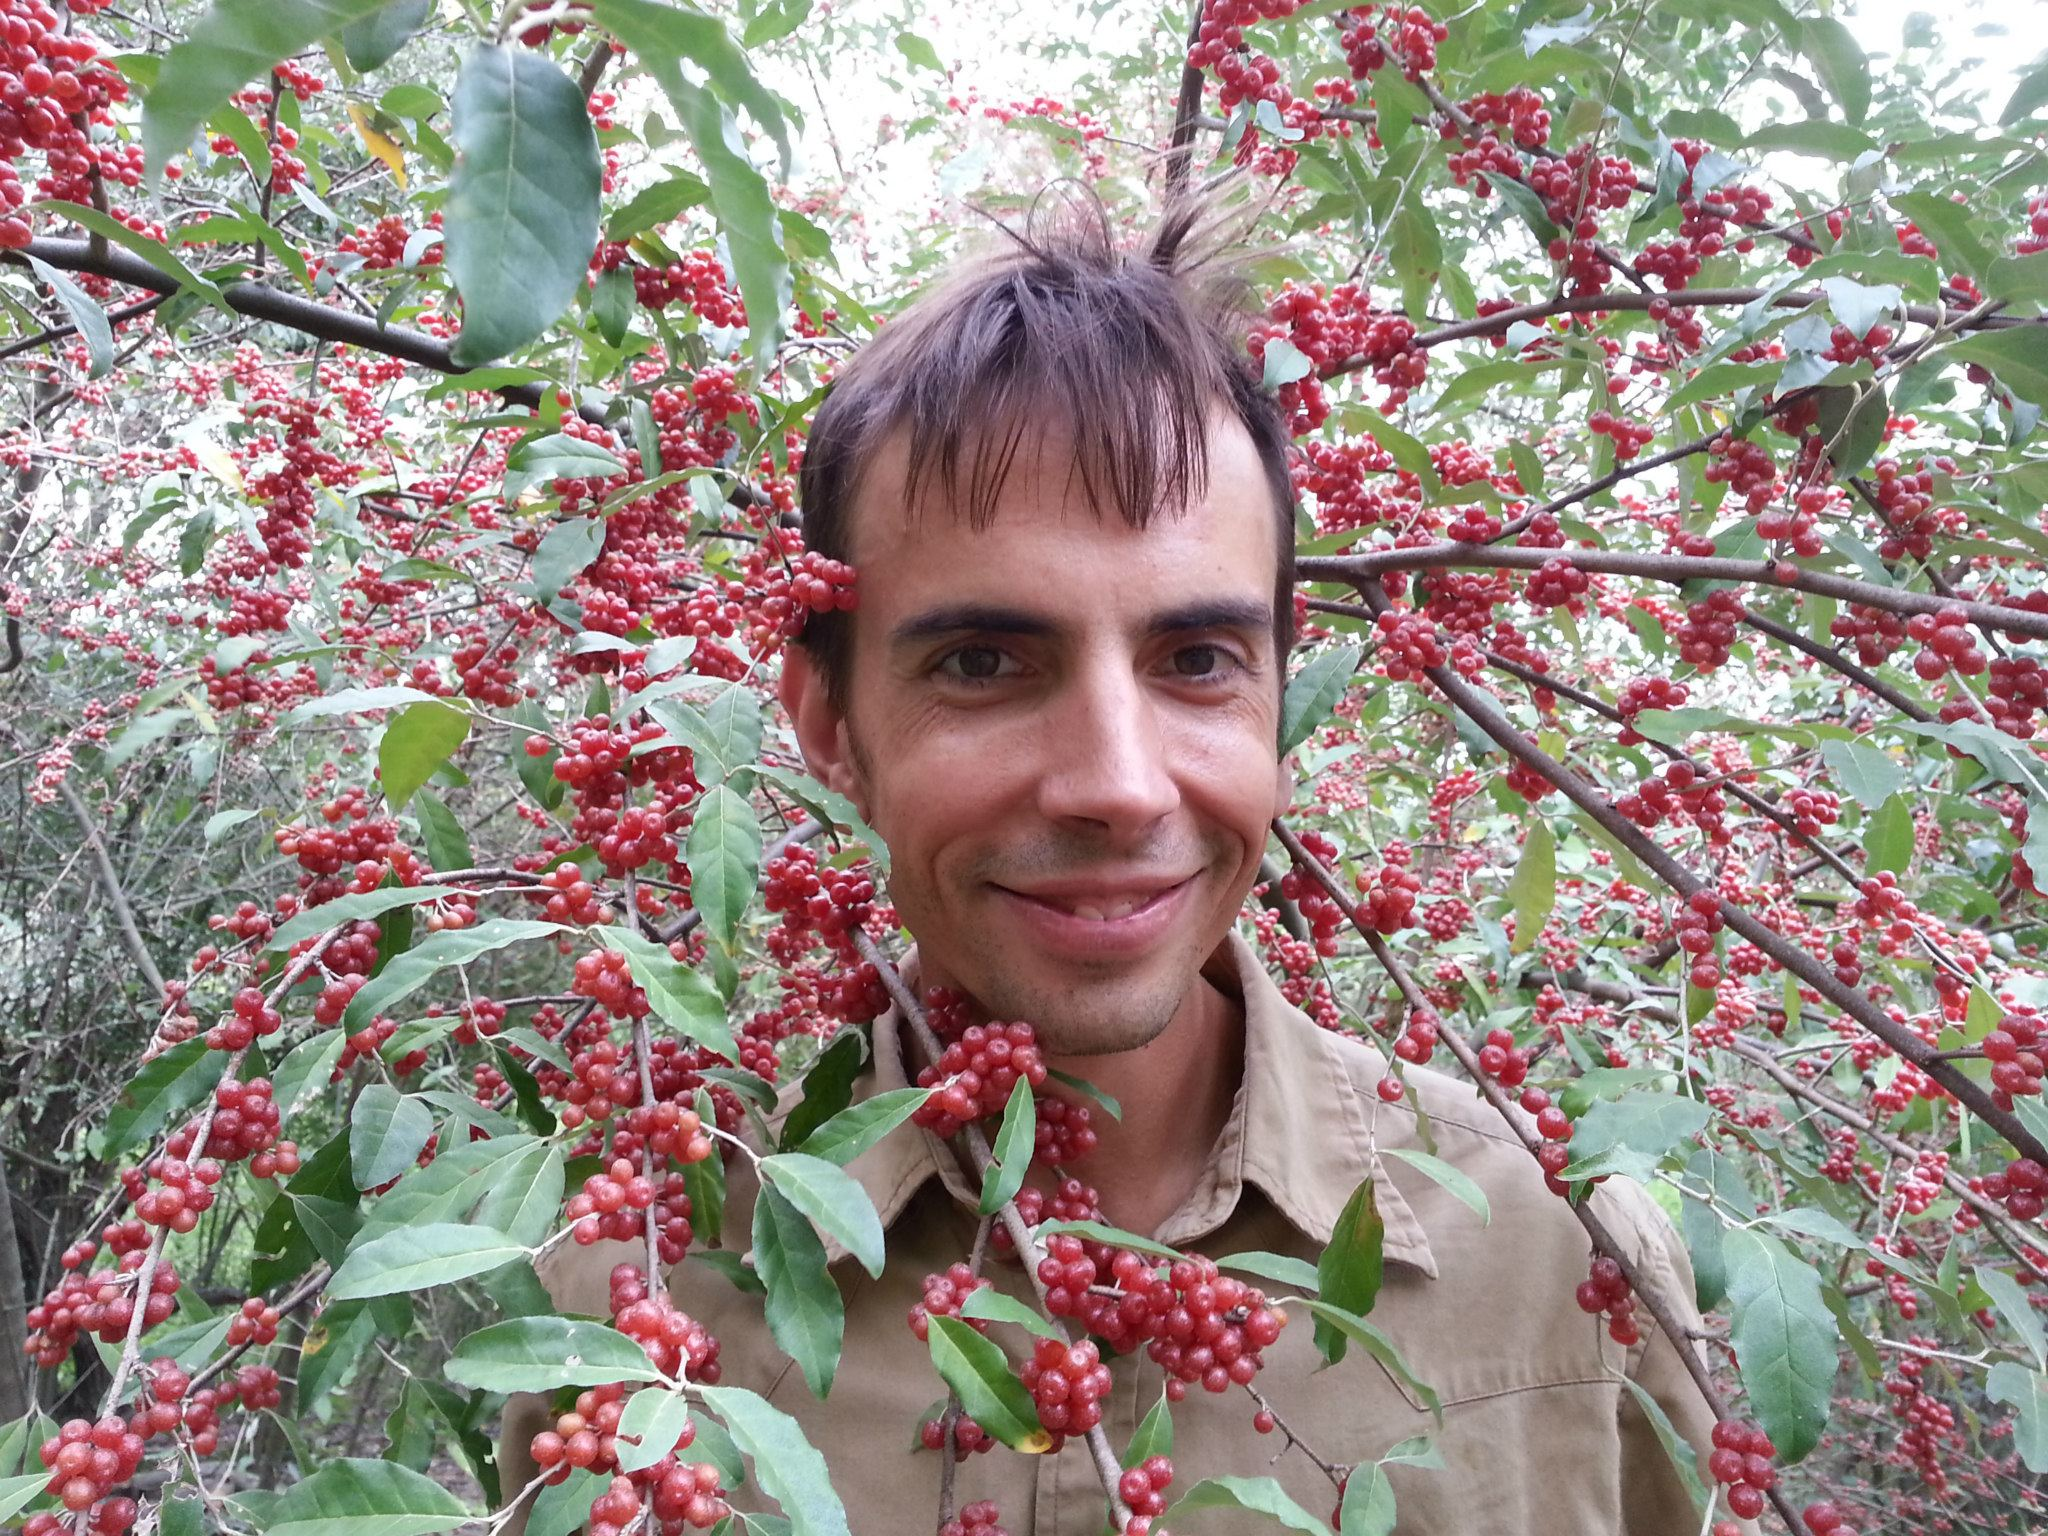 Autumn Berry: Chicago's Newest Startup Fruit – Techli